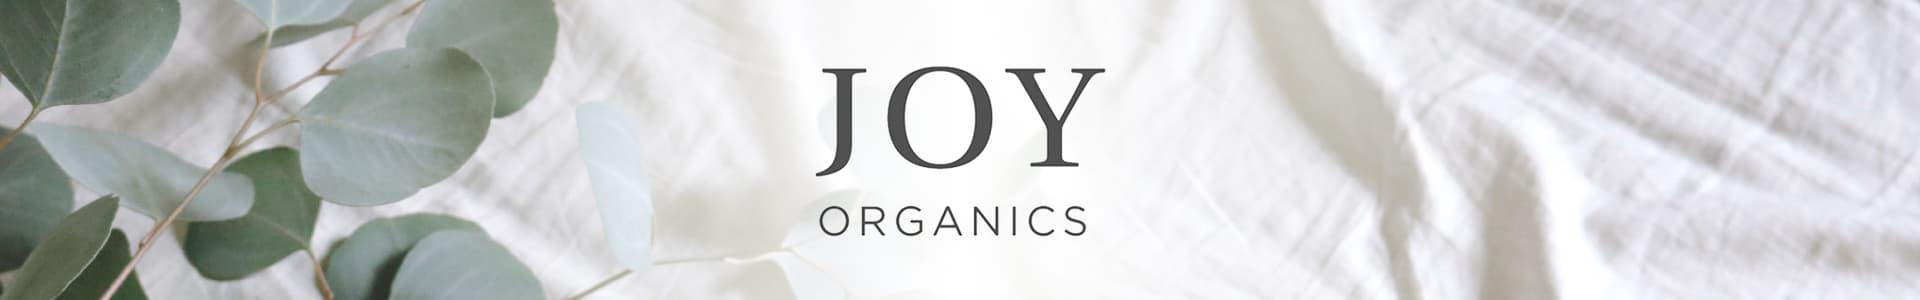 Buy Joy Organics CBD Online